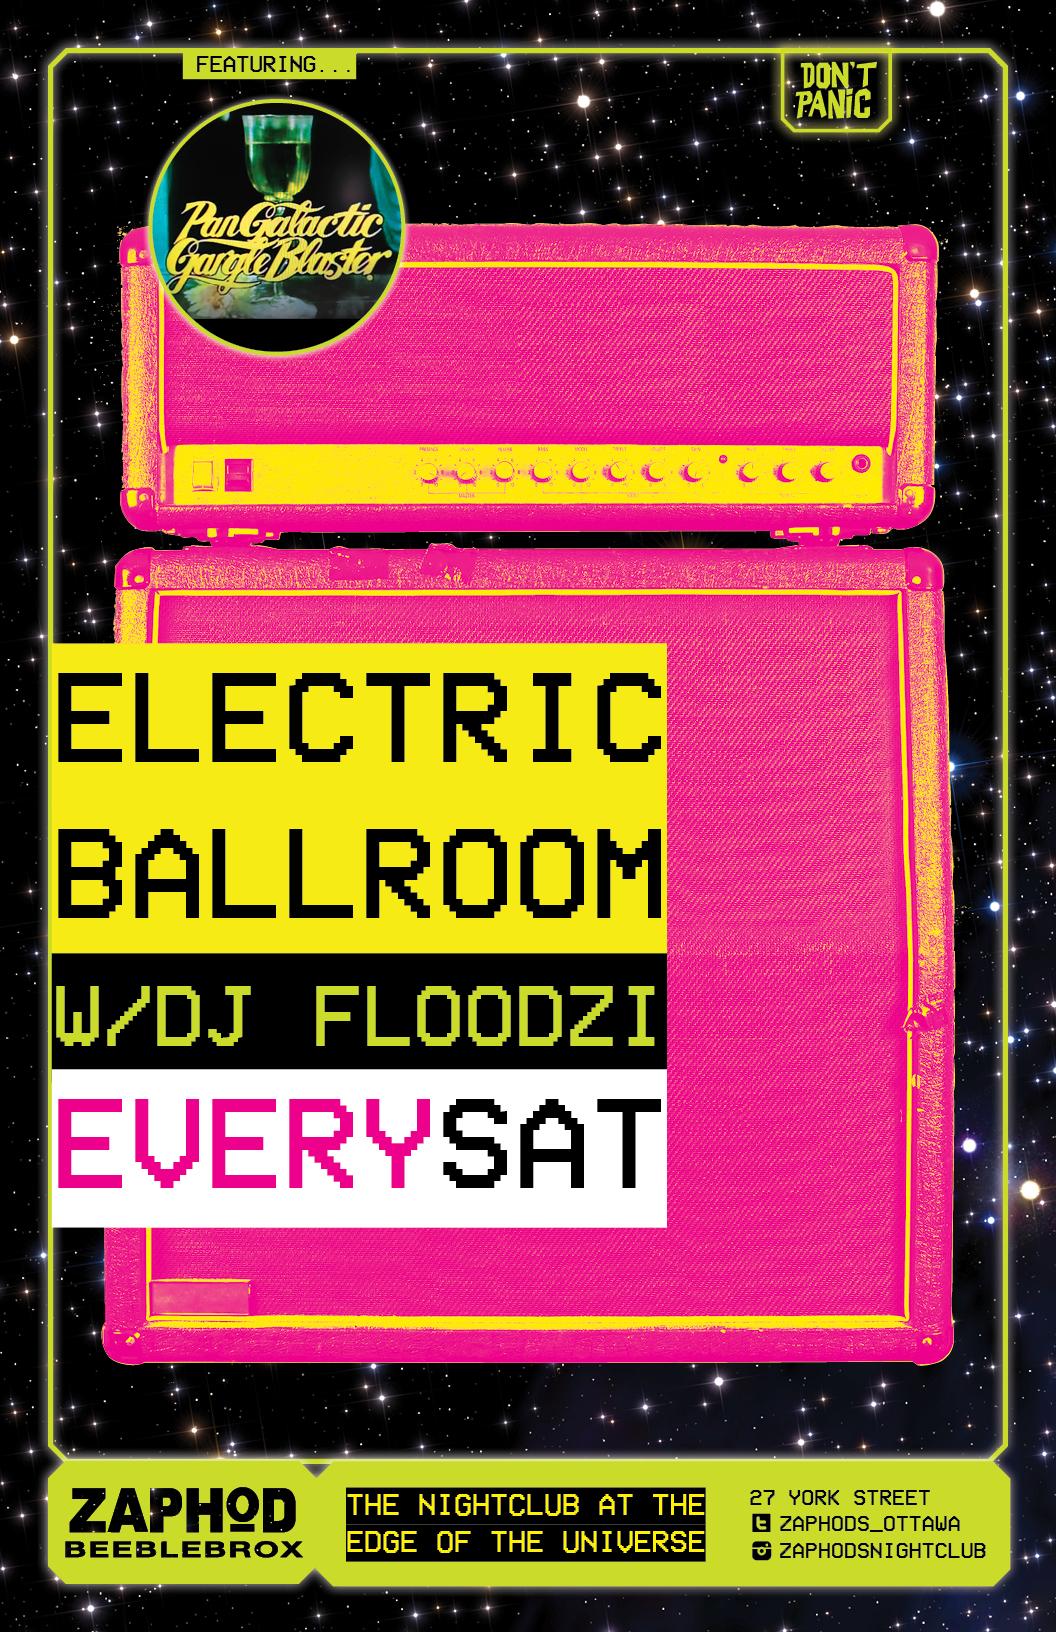 electricballroom-screen_final